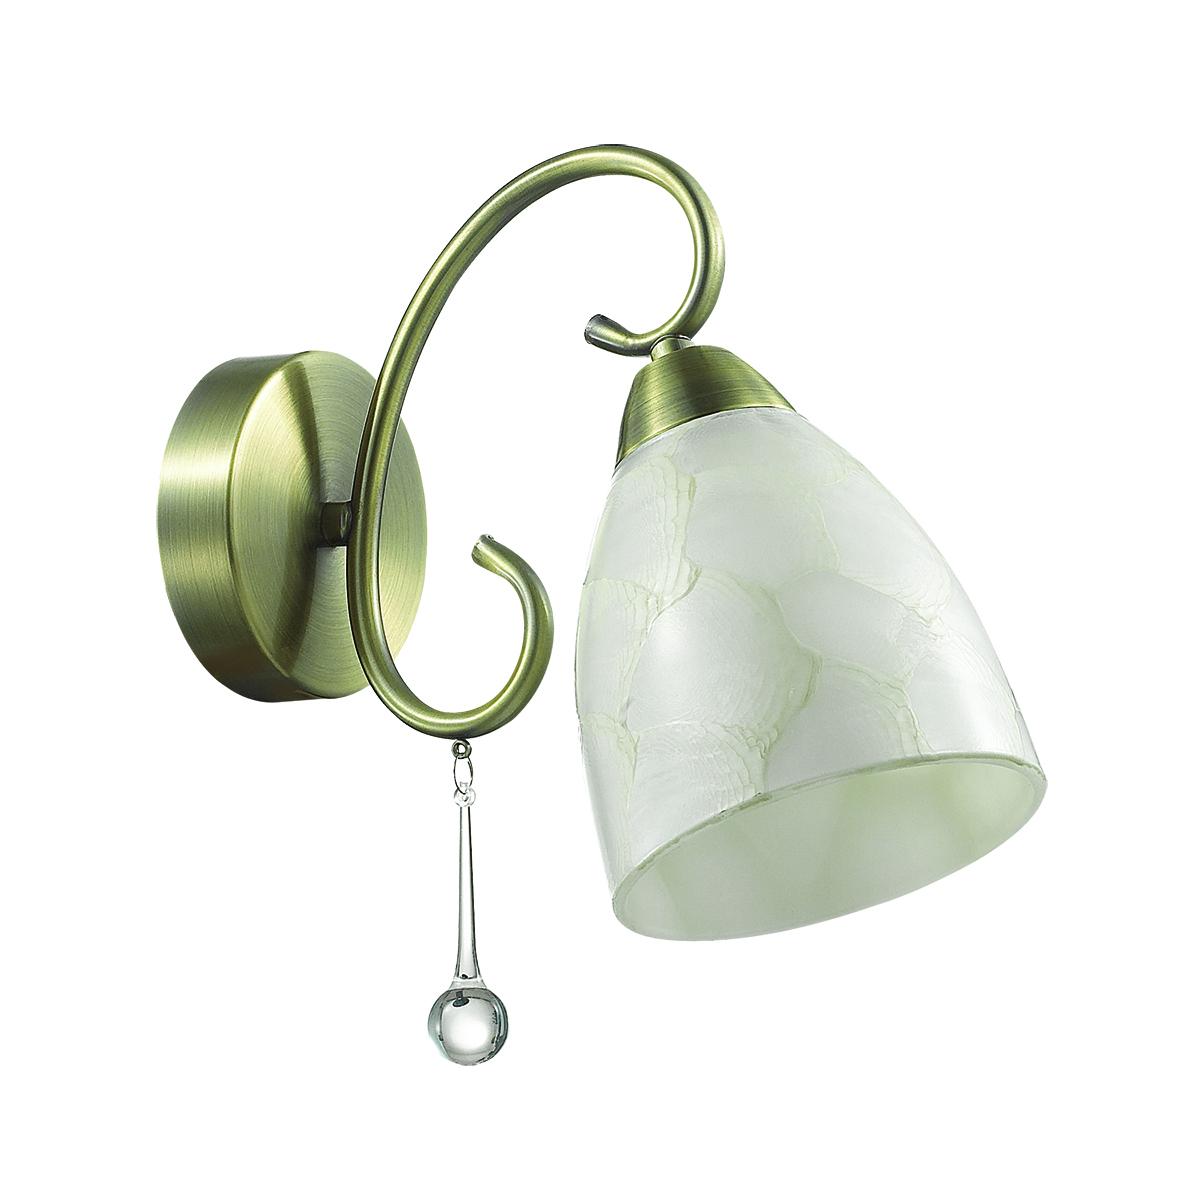 Бра Lumion Eleconca 3511/1W, 1xE27x60W, бронза, бежевый, прозрачный, металл, стекло - фото 2